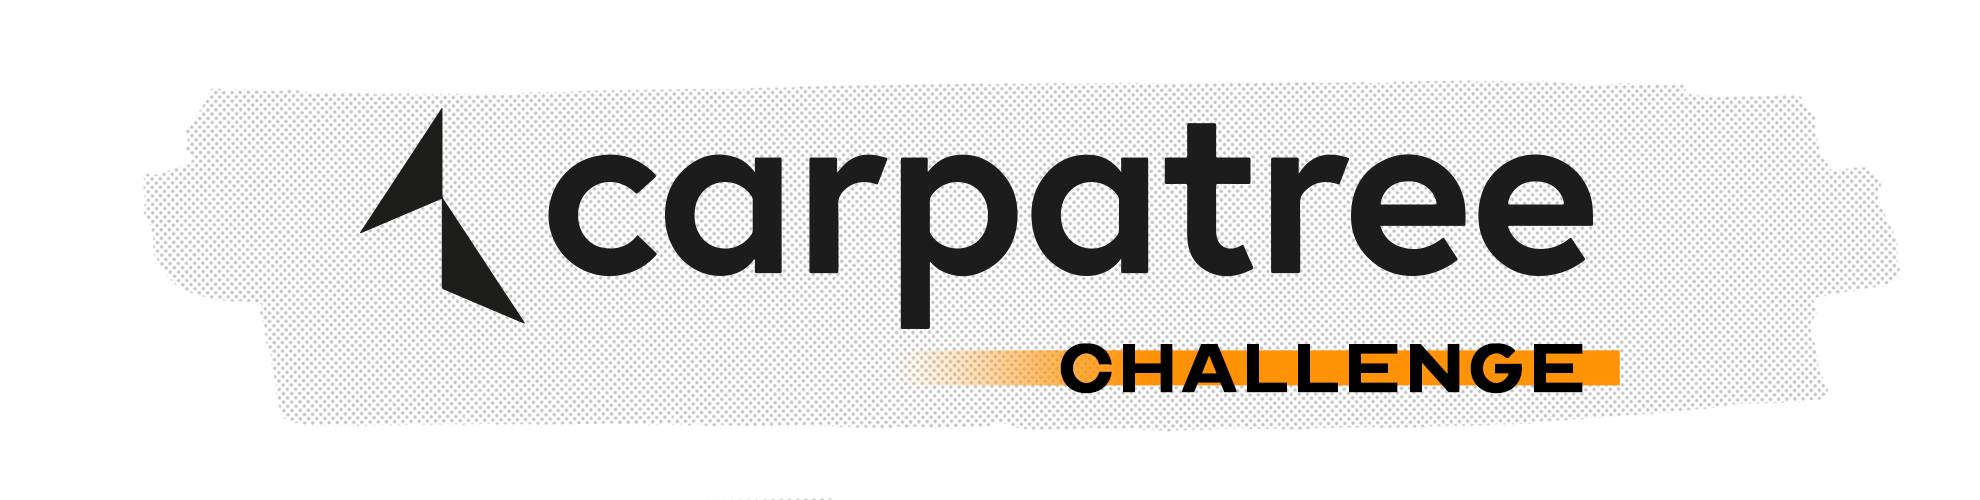 Carpatree Challenge